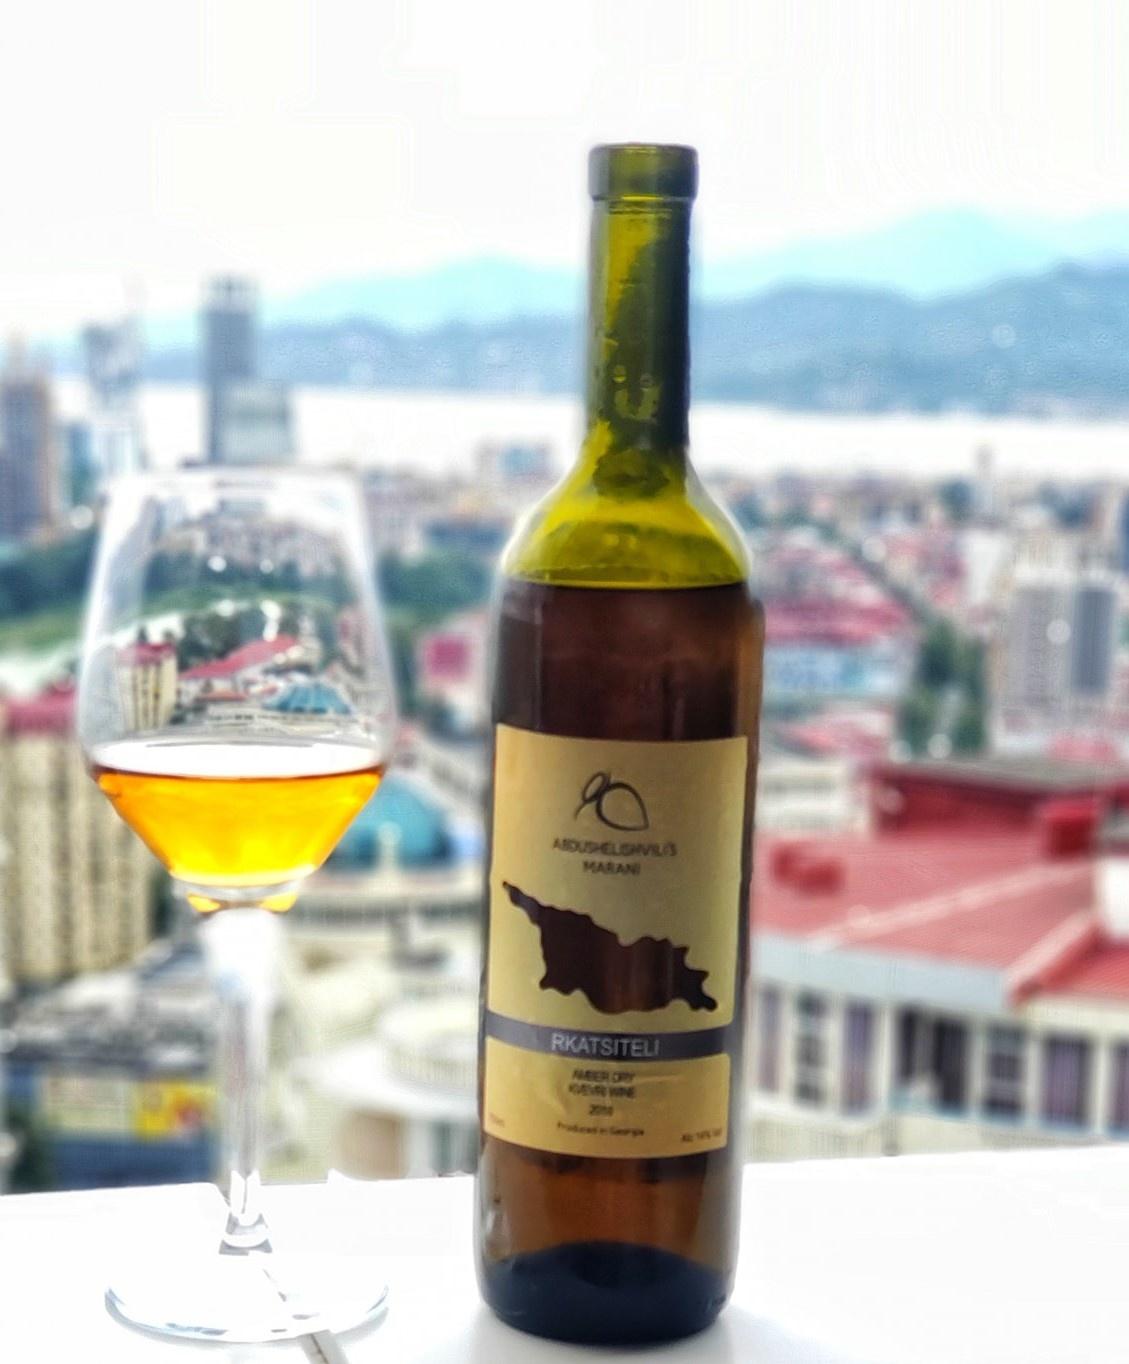 Abdushelishvili Winery Rkatsiteli Qvevri, Amber droog wijn, Abdushelishvili